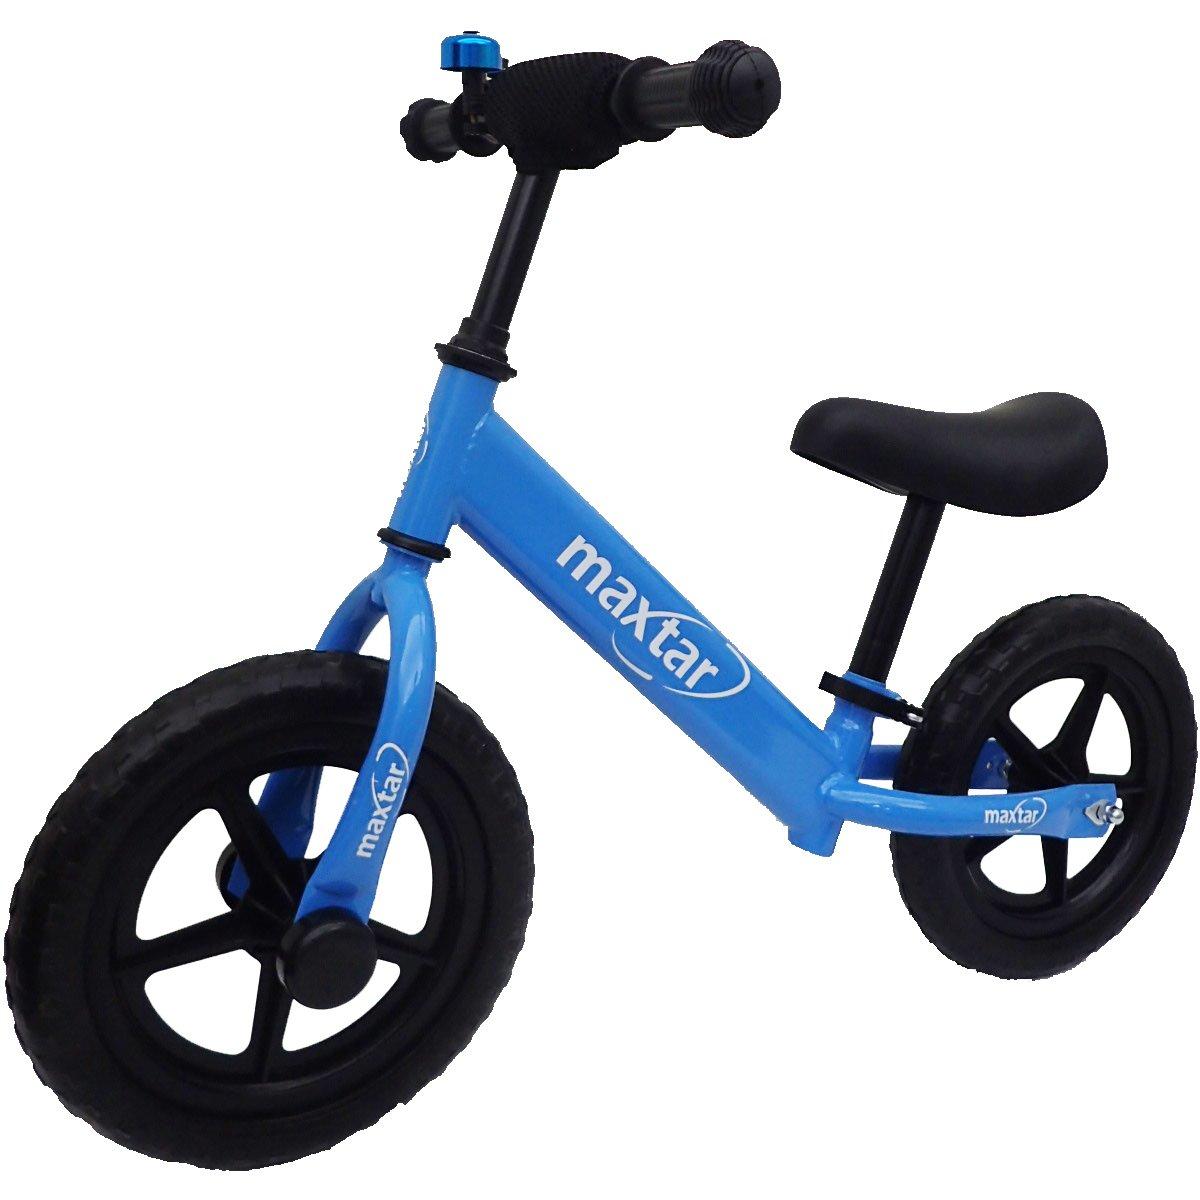 Bicicleta fara pedale Maxtar Sebra, Albastru, 12 inch